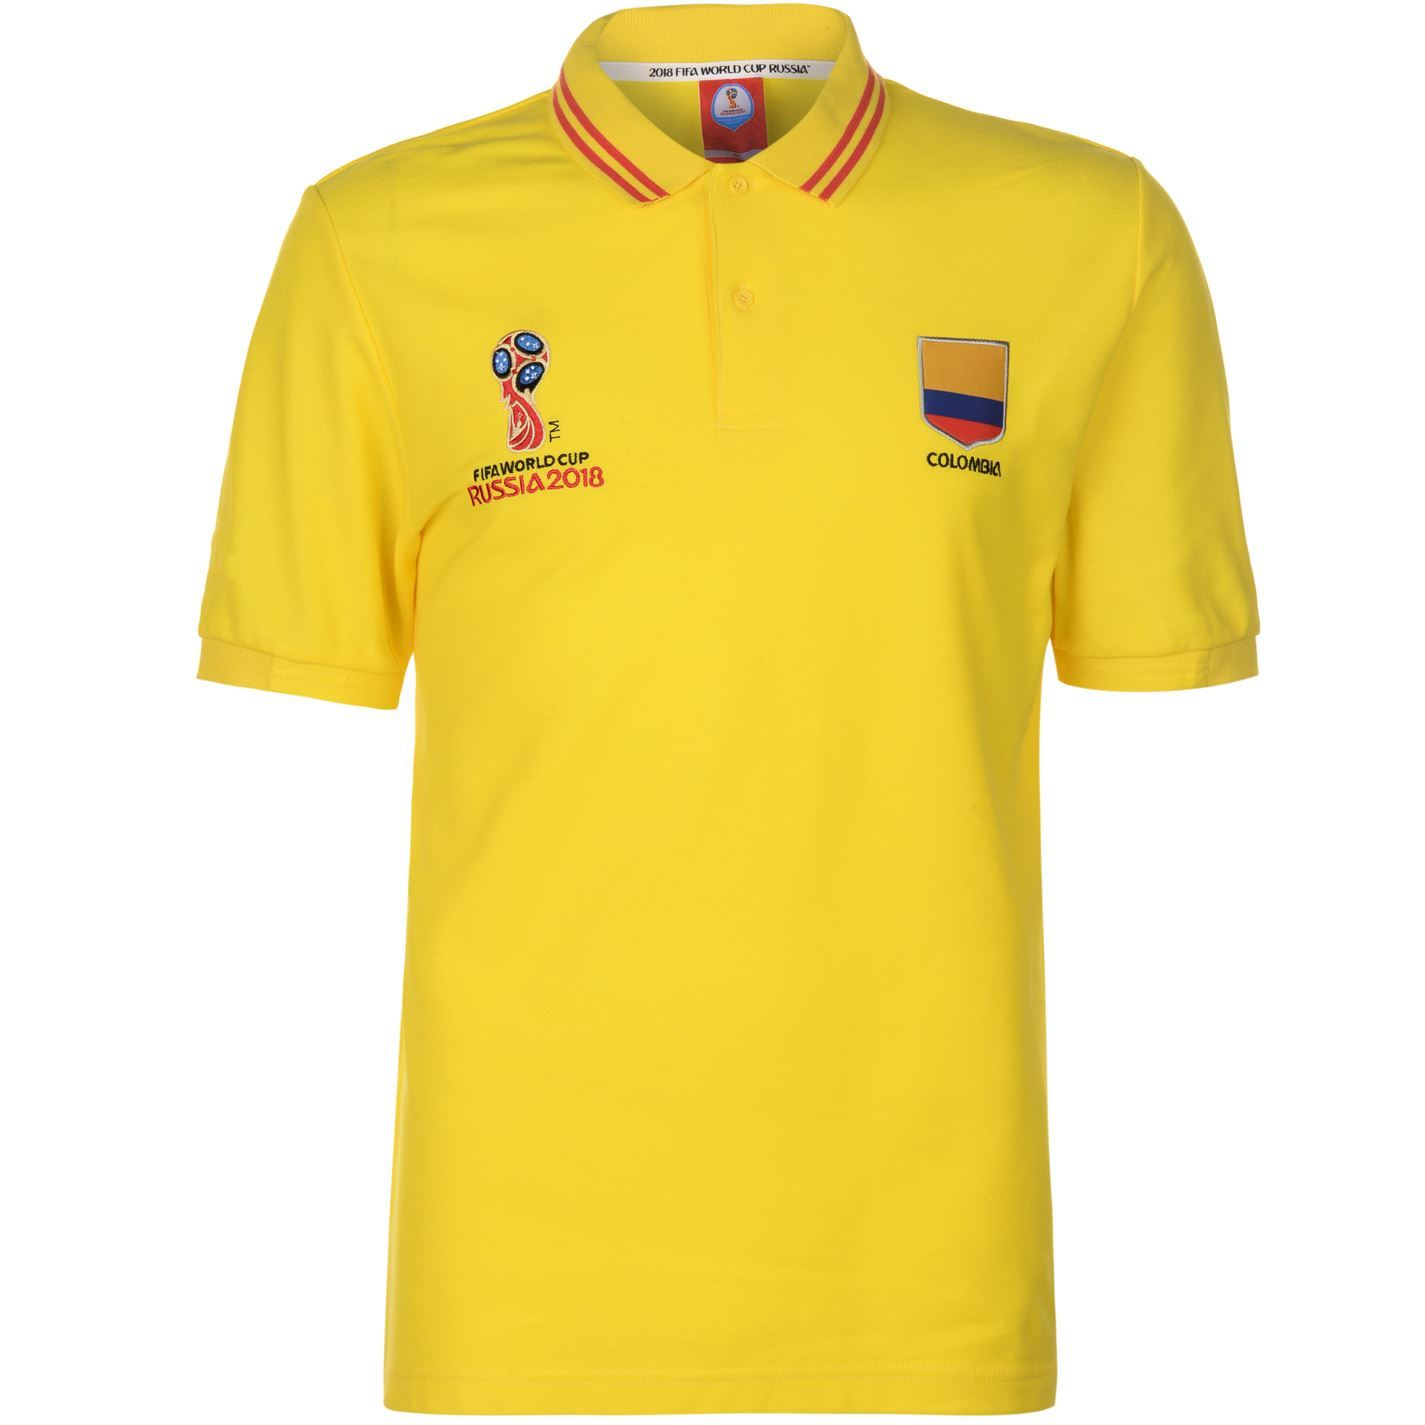 aeffec8b2 ... FIFA World Cup 2018 Colombia camisa de Polo para hombre amarillo fútbol  fútbol camiseta Top ...